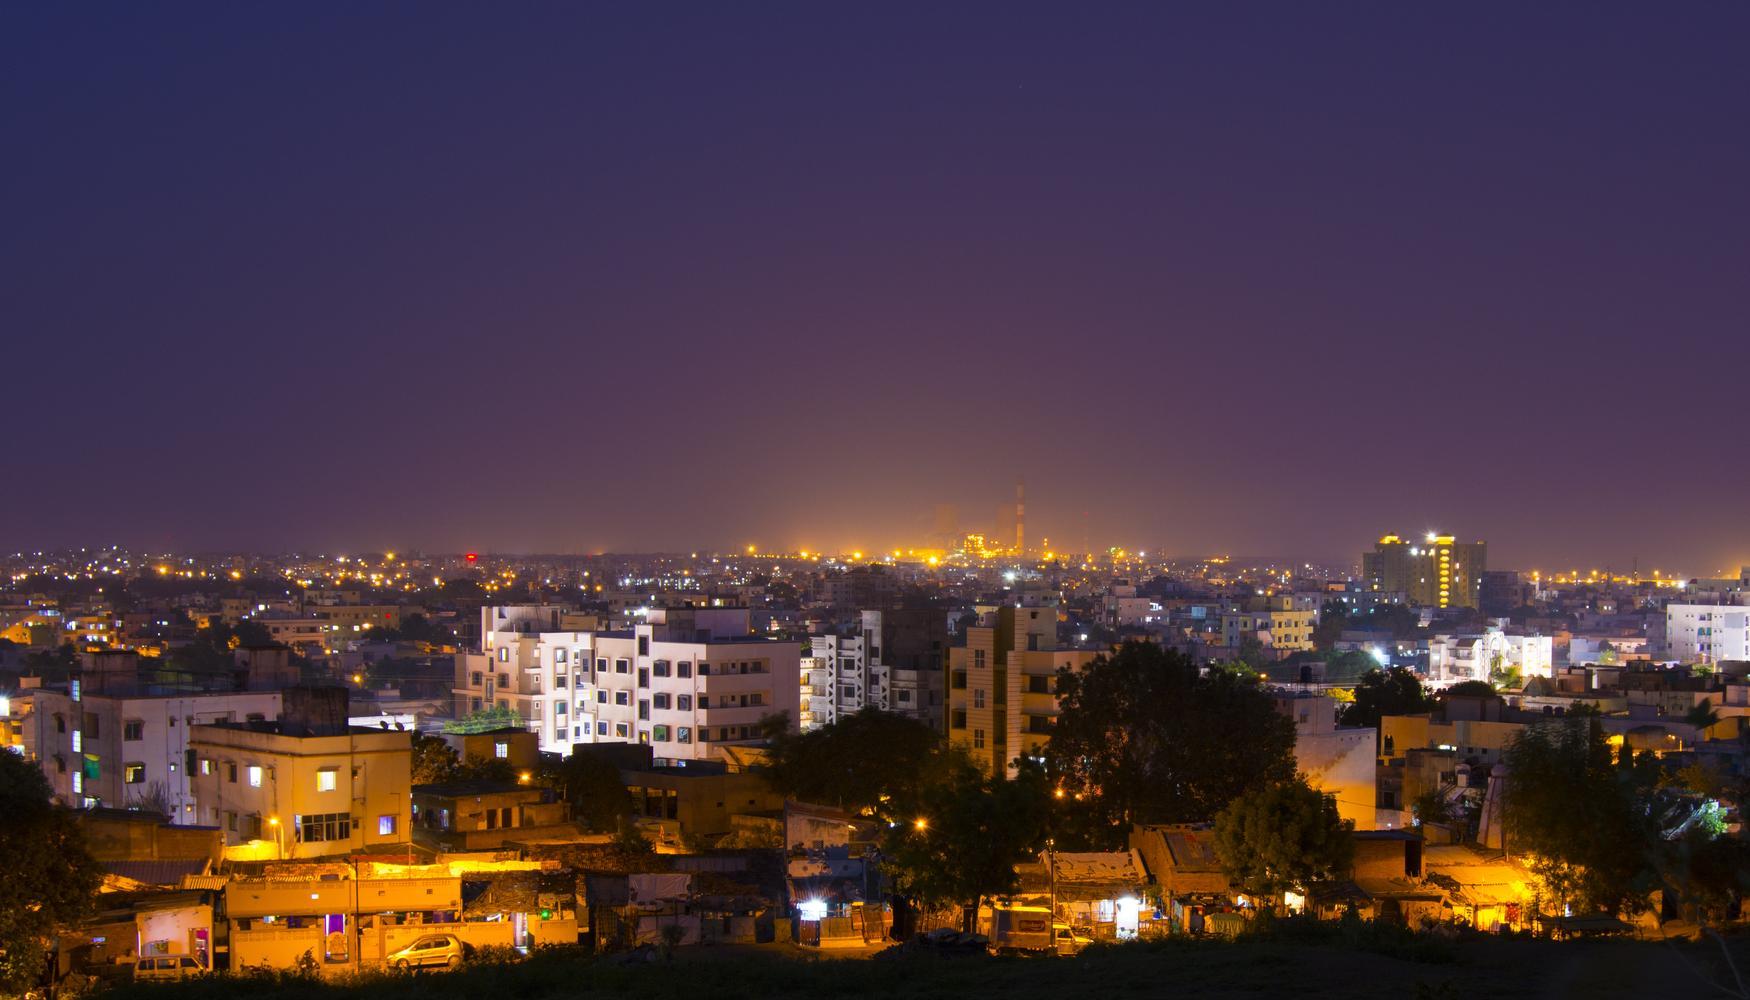 Alquiler de coches en Aeropuerto Nagpur Dr. Babasaheb Ambedkar Intl